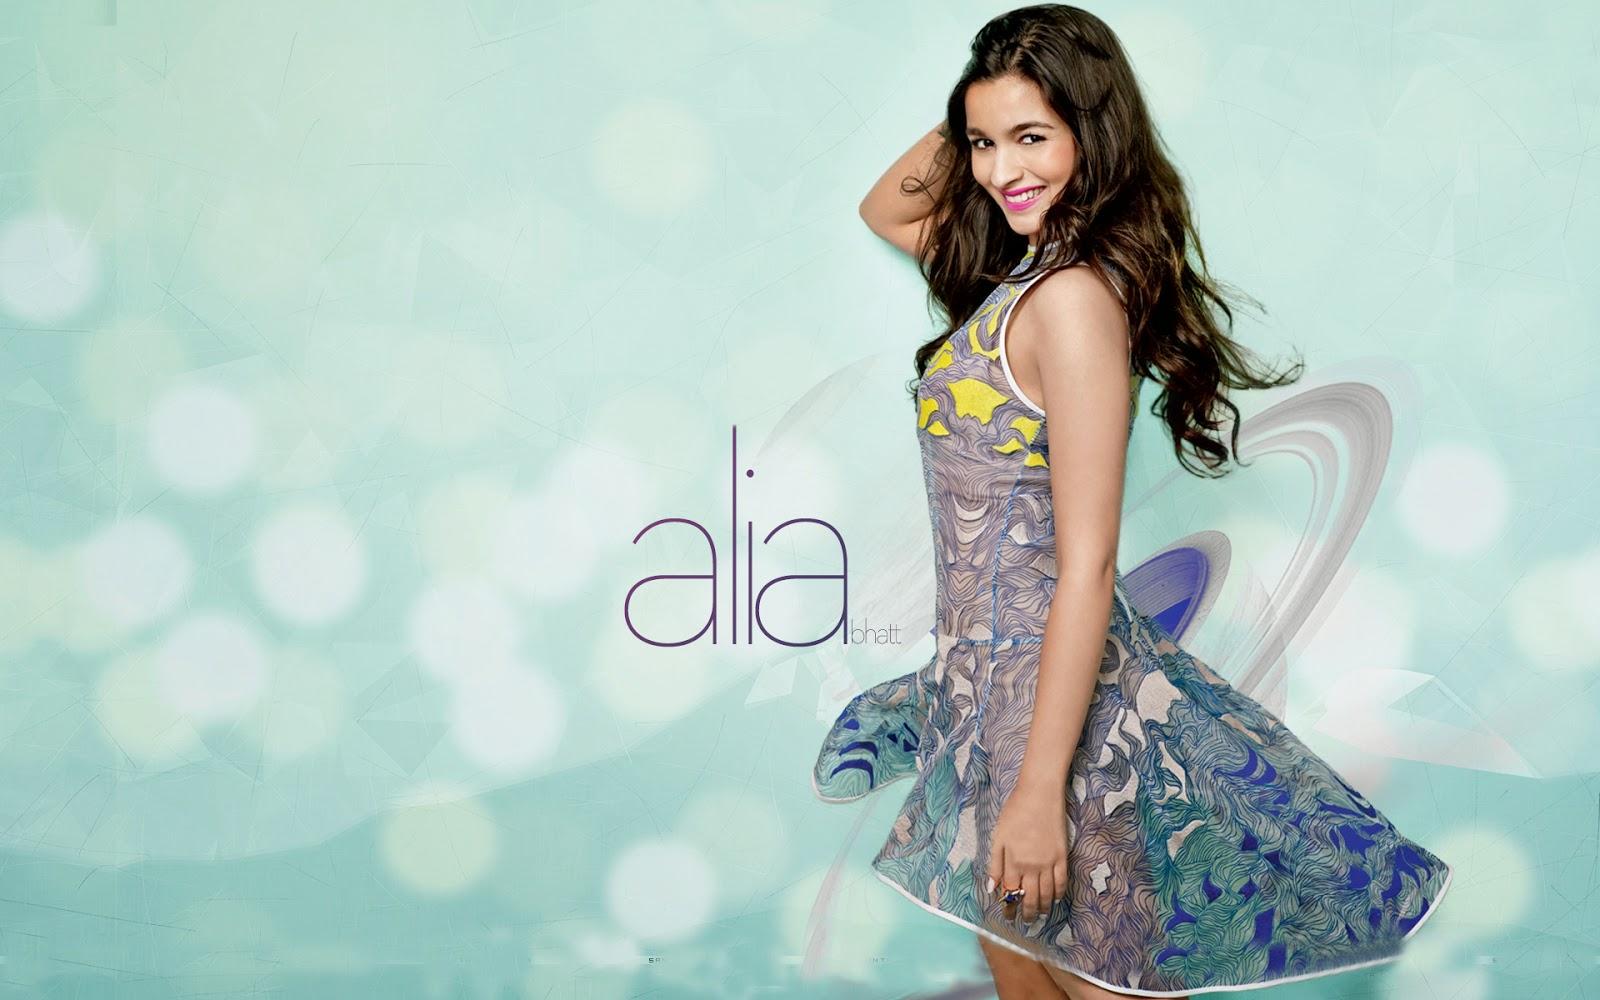 Alia Bhatt Image: Global Pictures Gallery: Alia Bhatt Full HD Wallpapers